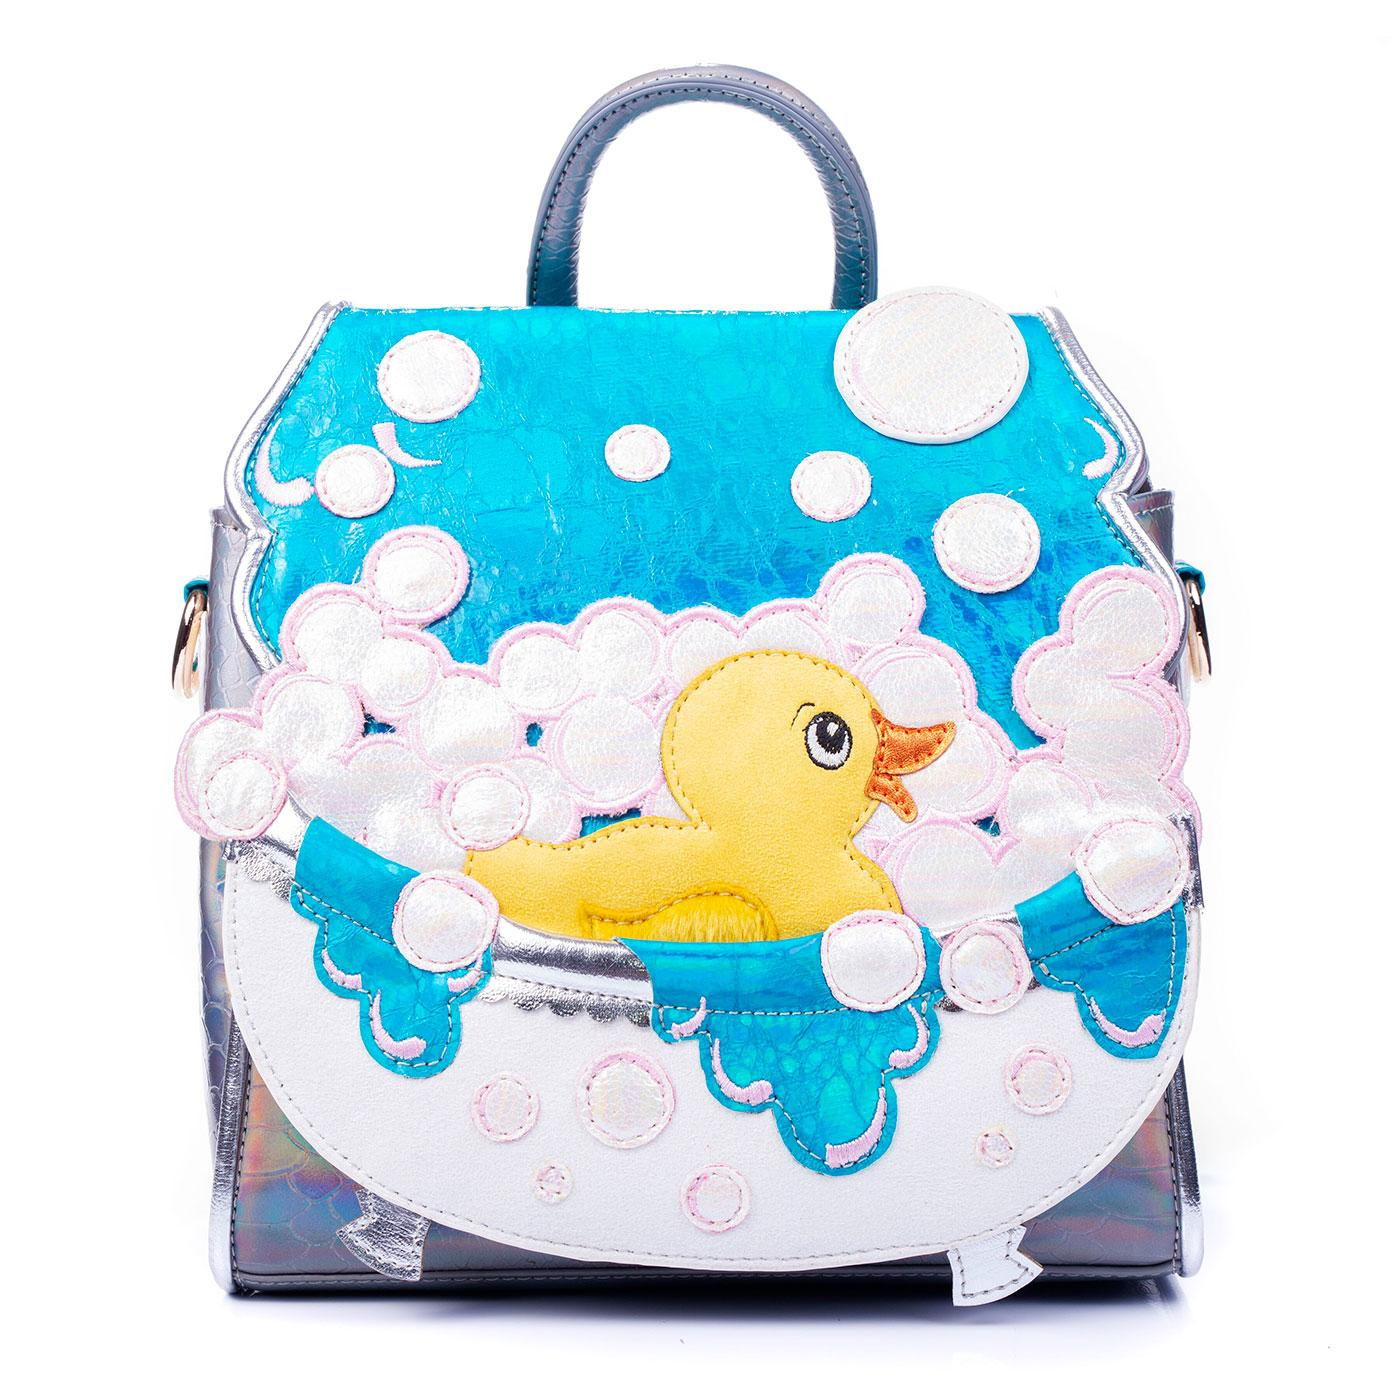 Bubble Bag IRREGULAR CHOICE Rubber Duck Bag